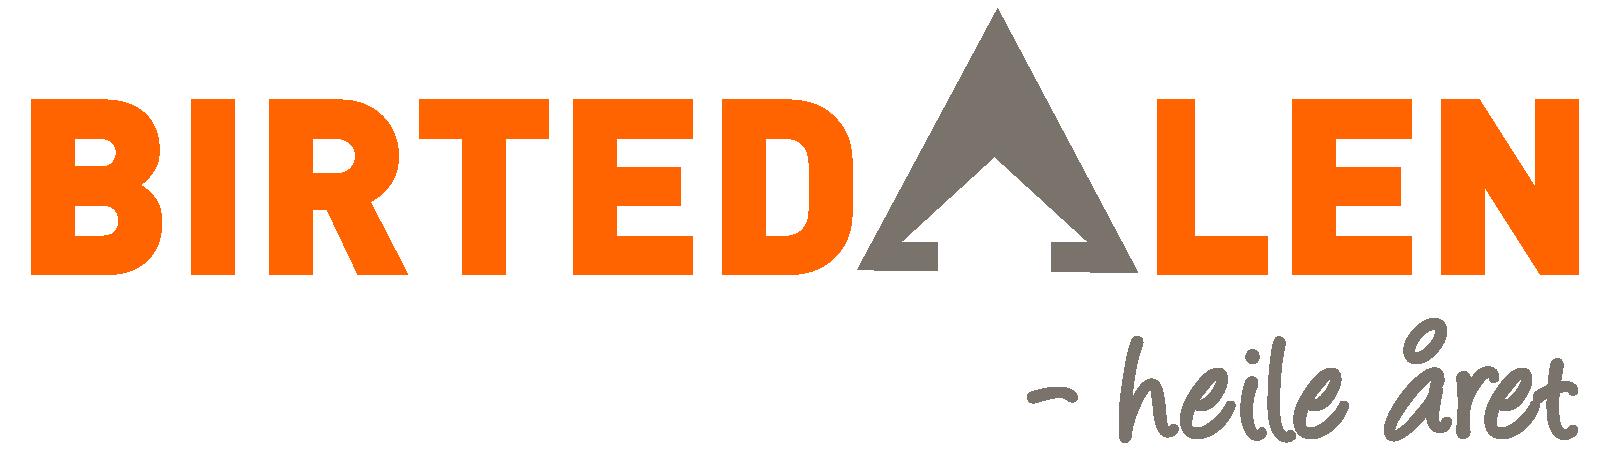 birtedalen-logo-proto